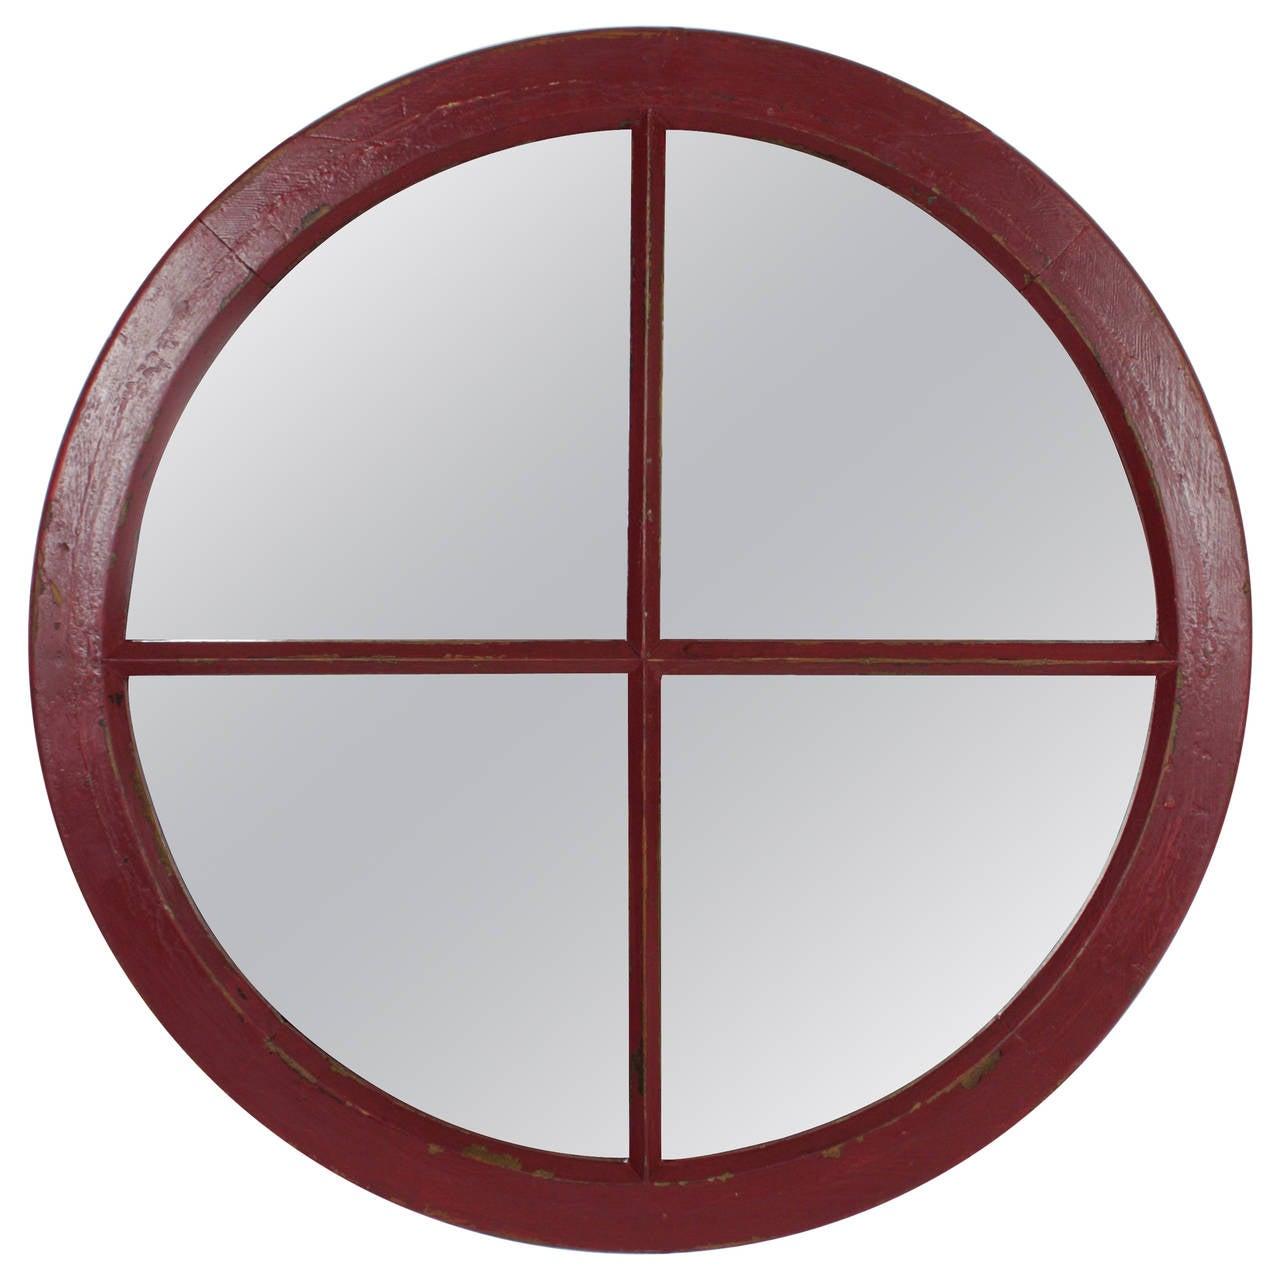 19th c. Industrial Circular Wood Windowframe as Mirror